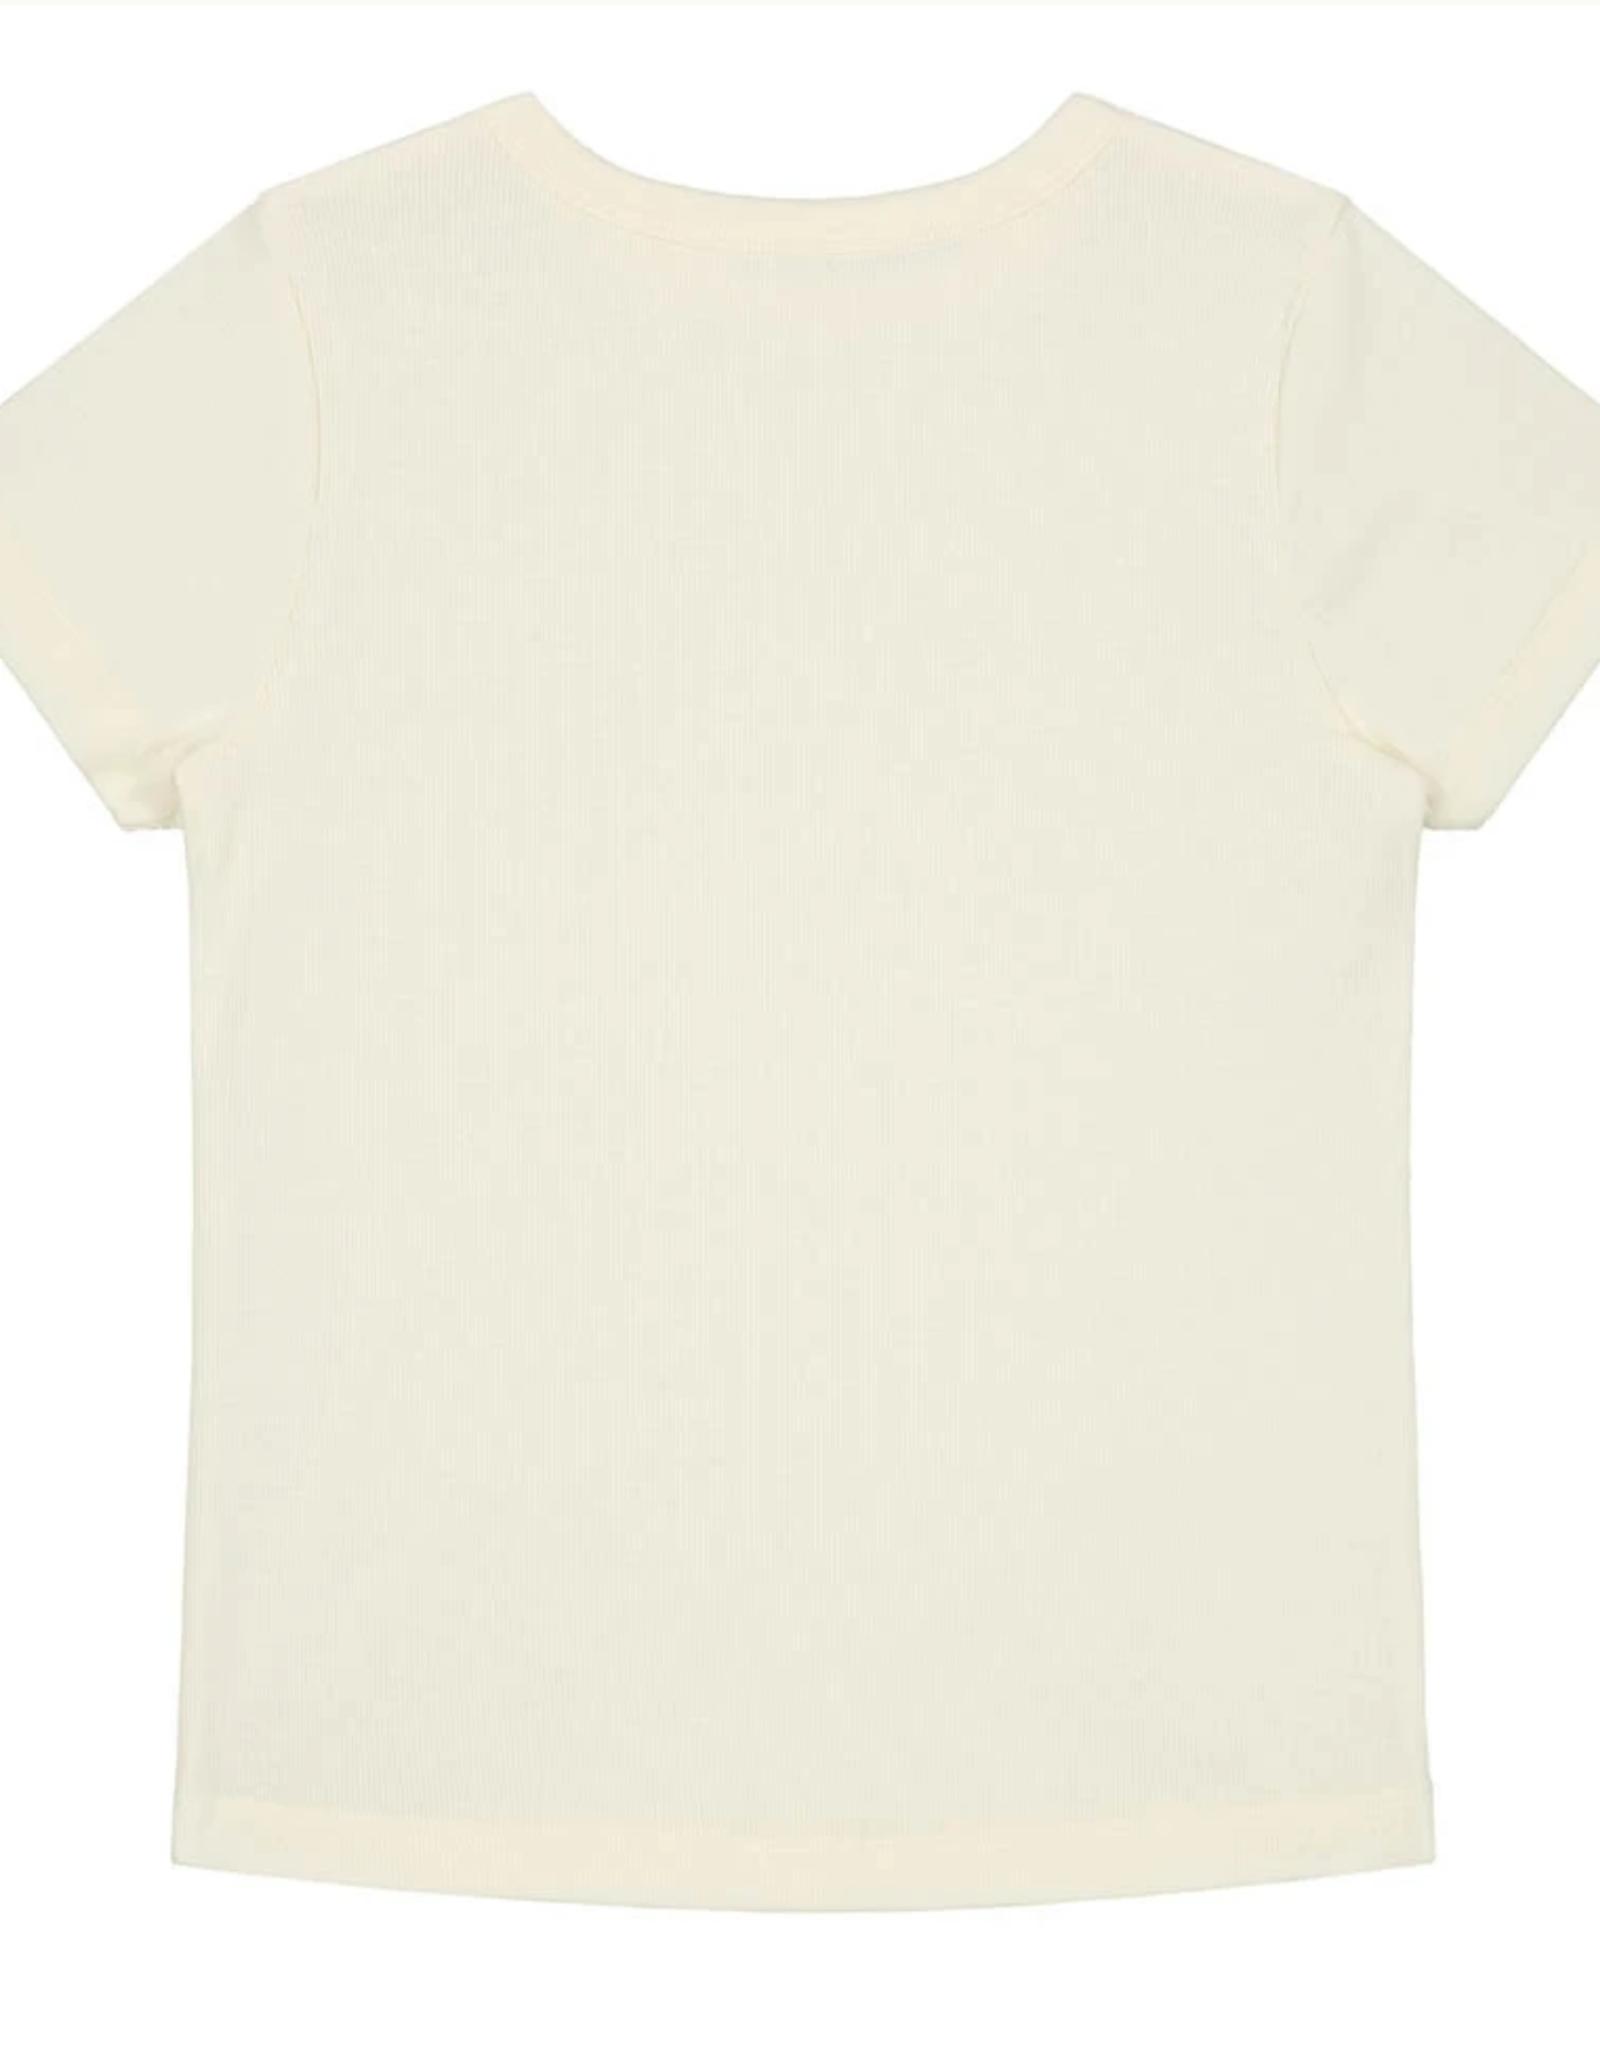 Gray Label T-shirt